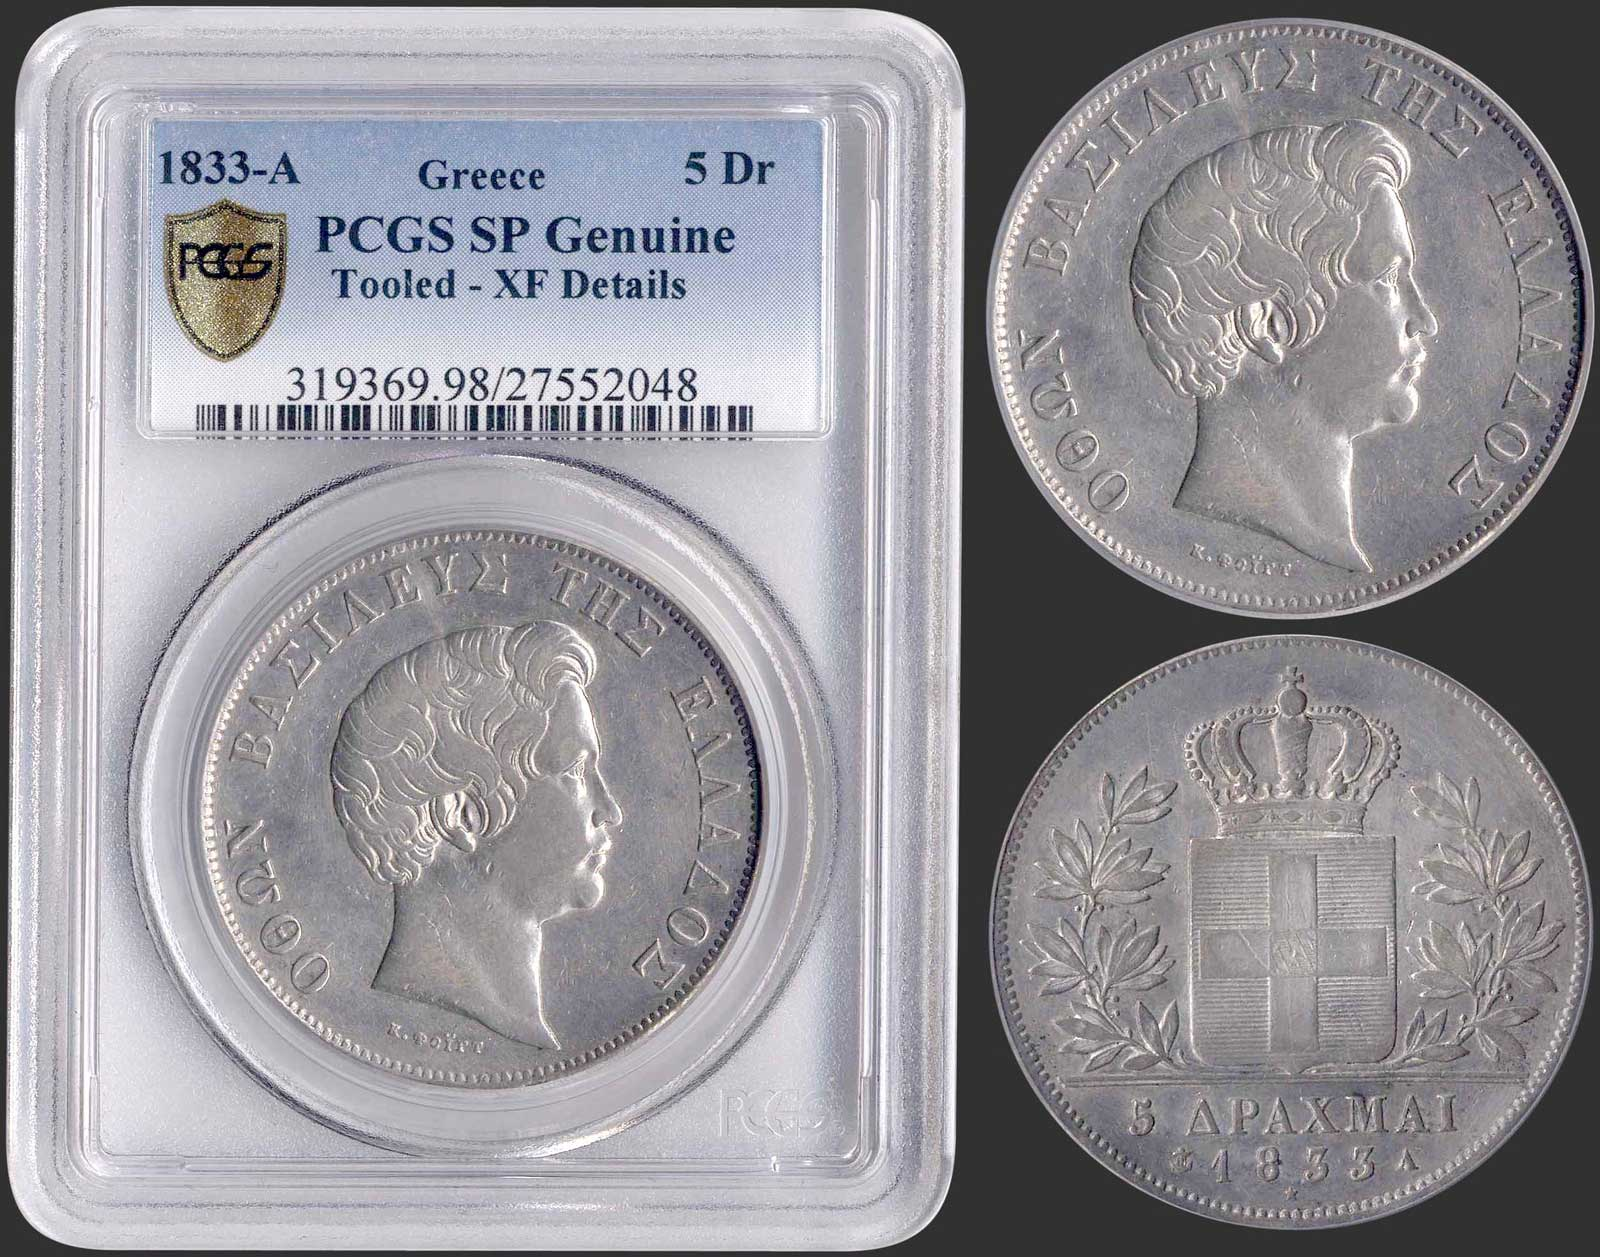 Lot 9056 - GREECE-  COINS & TOKENS king otto -  A. Karamitsos Public & LIVE Bid Auction 610 Coins, Medals & Banknotes